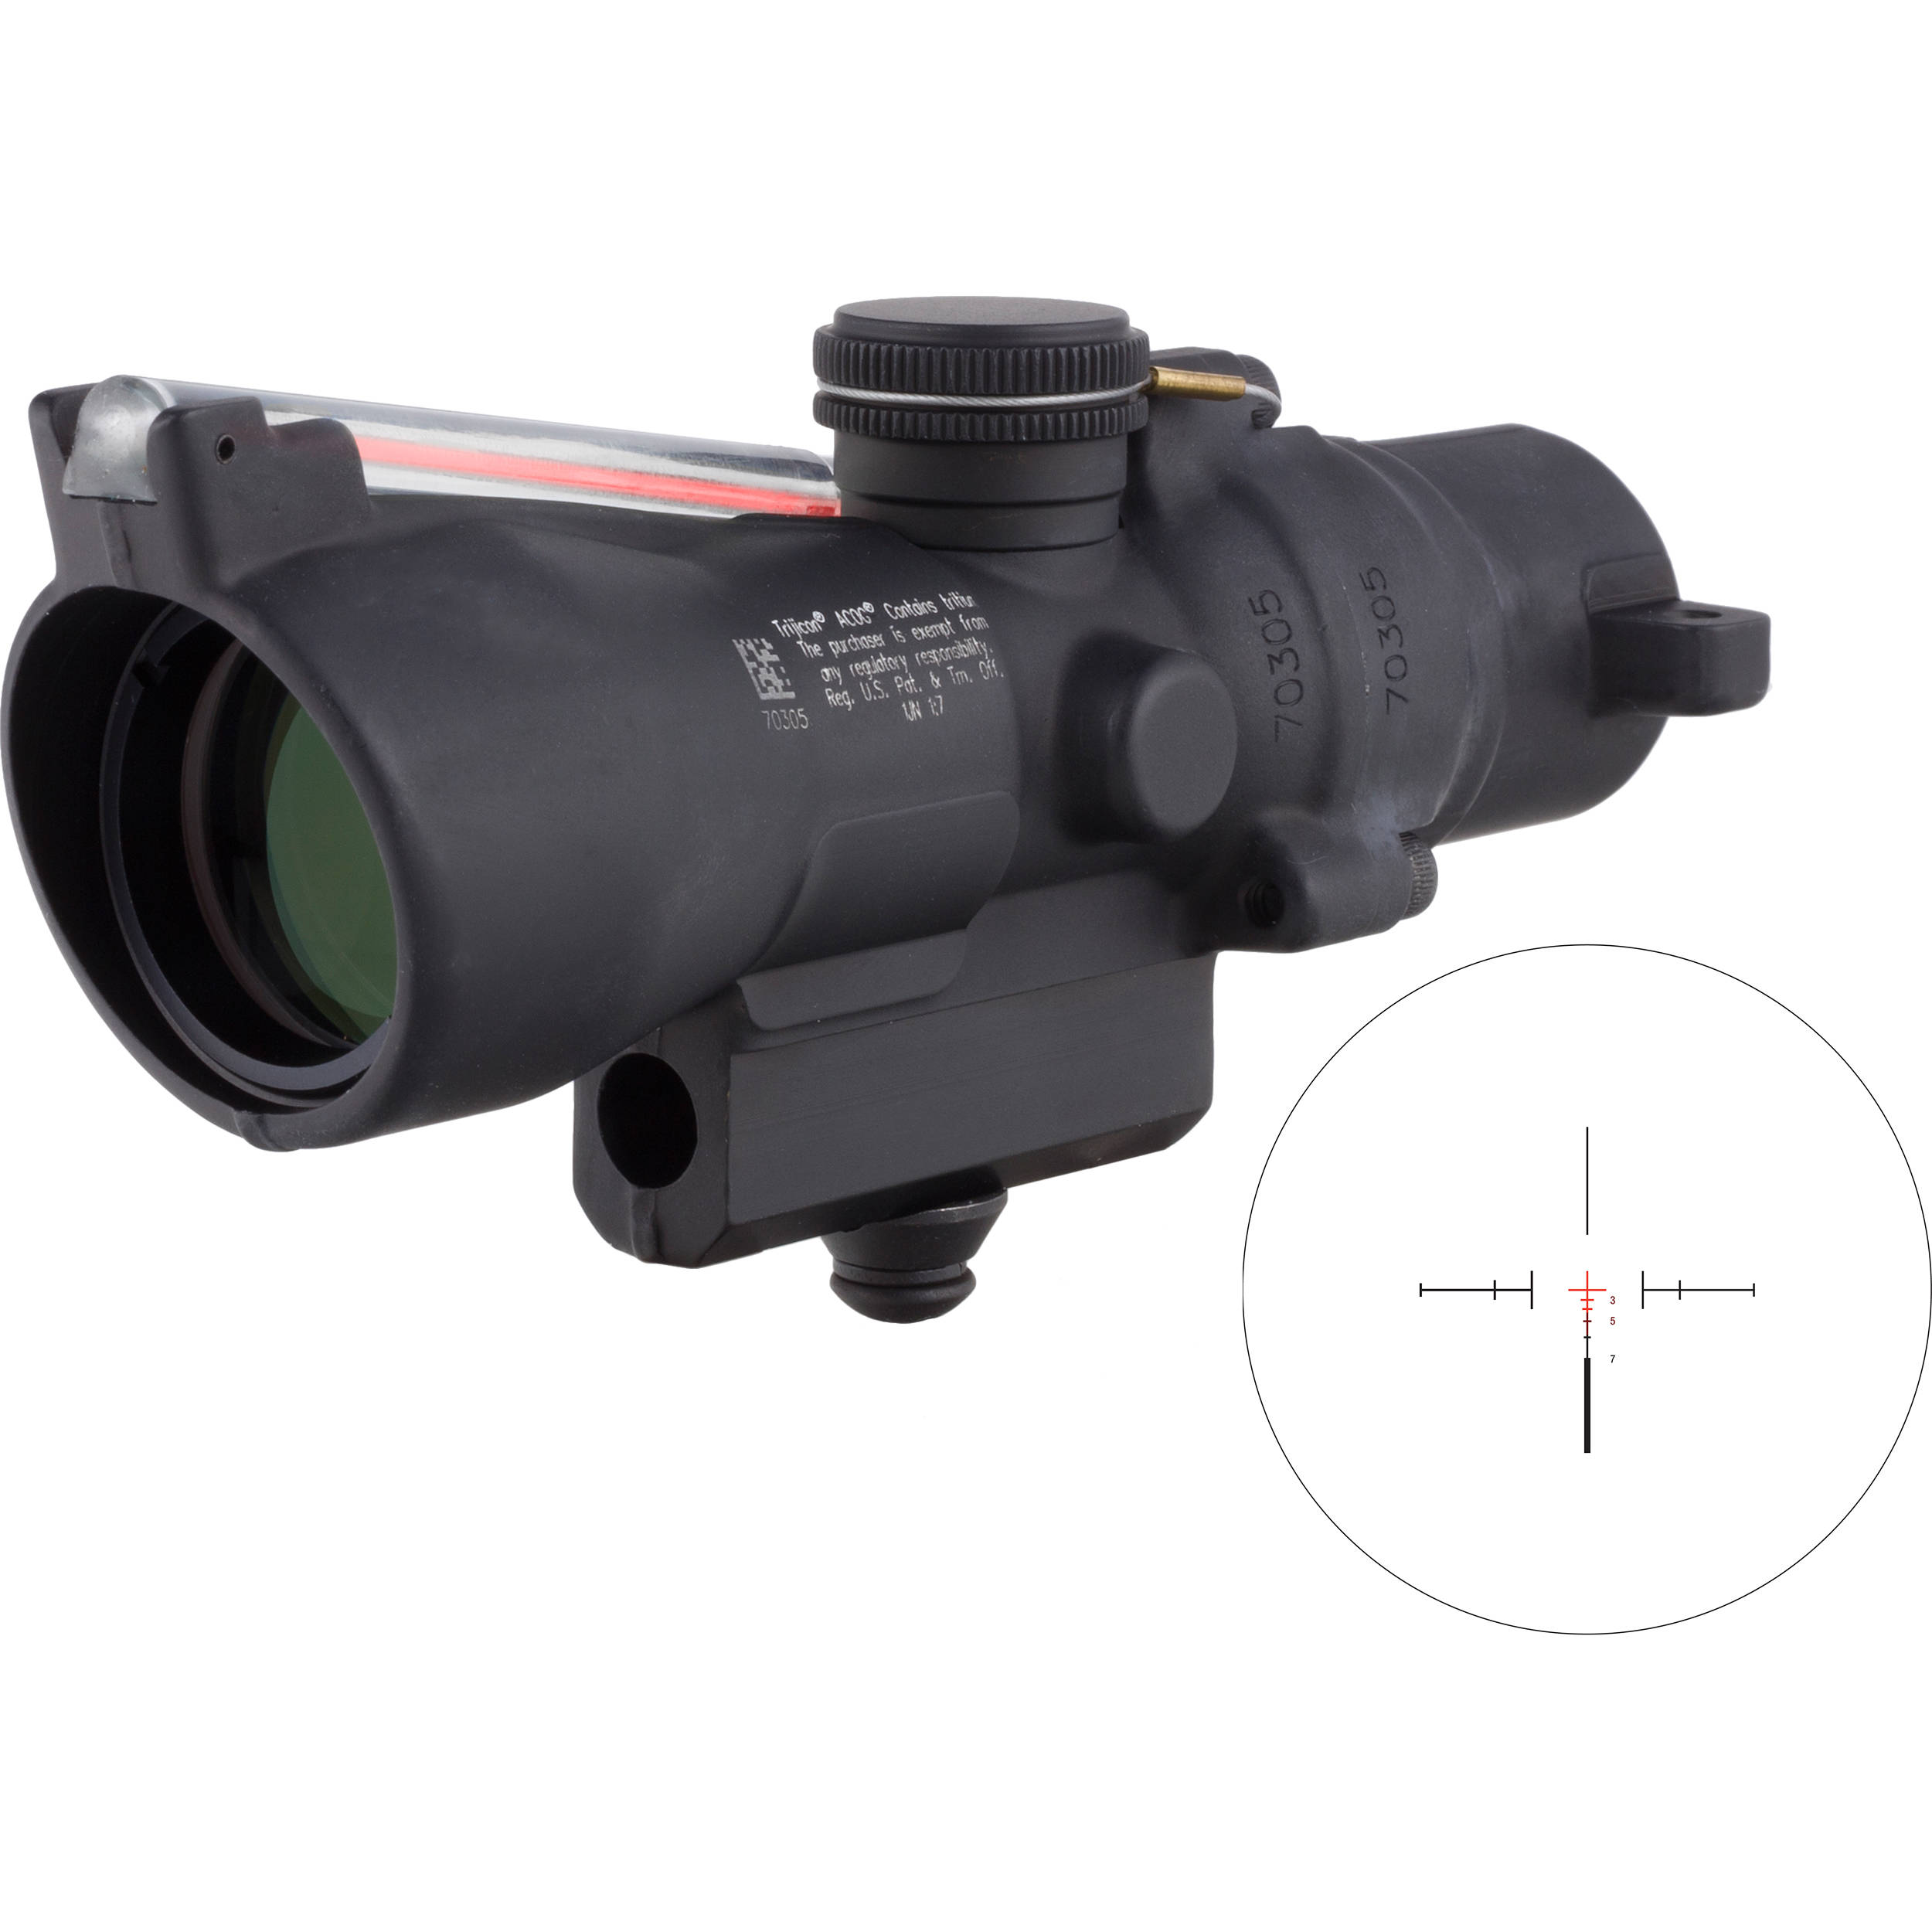 Trijicon 3x24 Compact ACOG Riflescope TA50-C-400223 B&H Photo M16 Acog